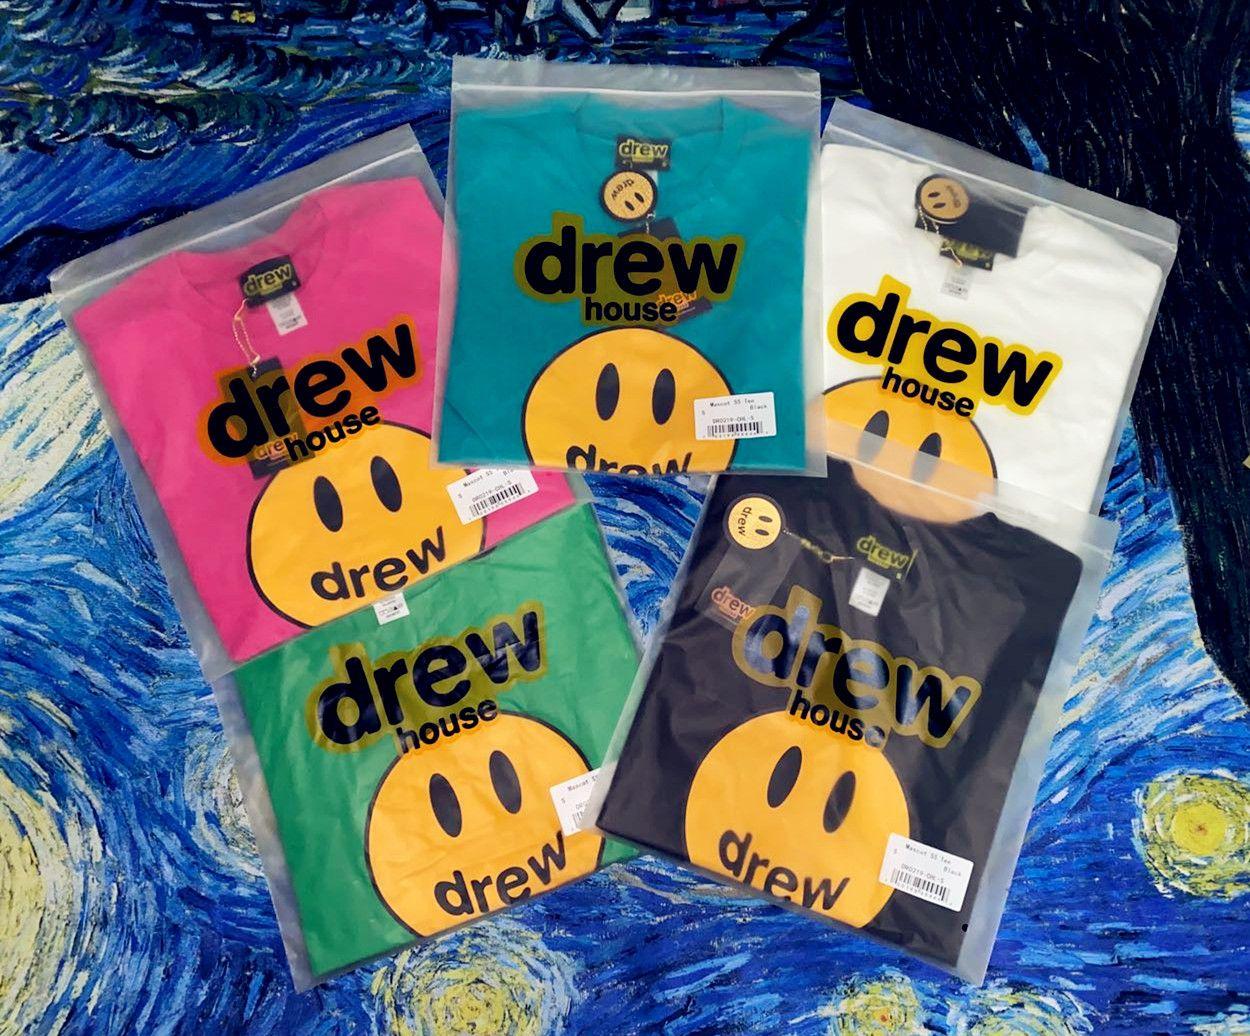 2021ss Drew House Yeni Varış Drew House T Gömlek Gülümseme Drew Hip Hop Tee Moda Erkek Tshirt Kısa Kollu O-Boyun Pamuk